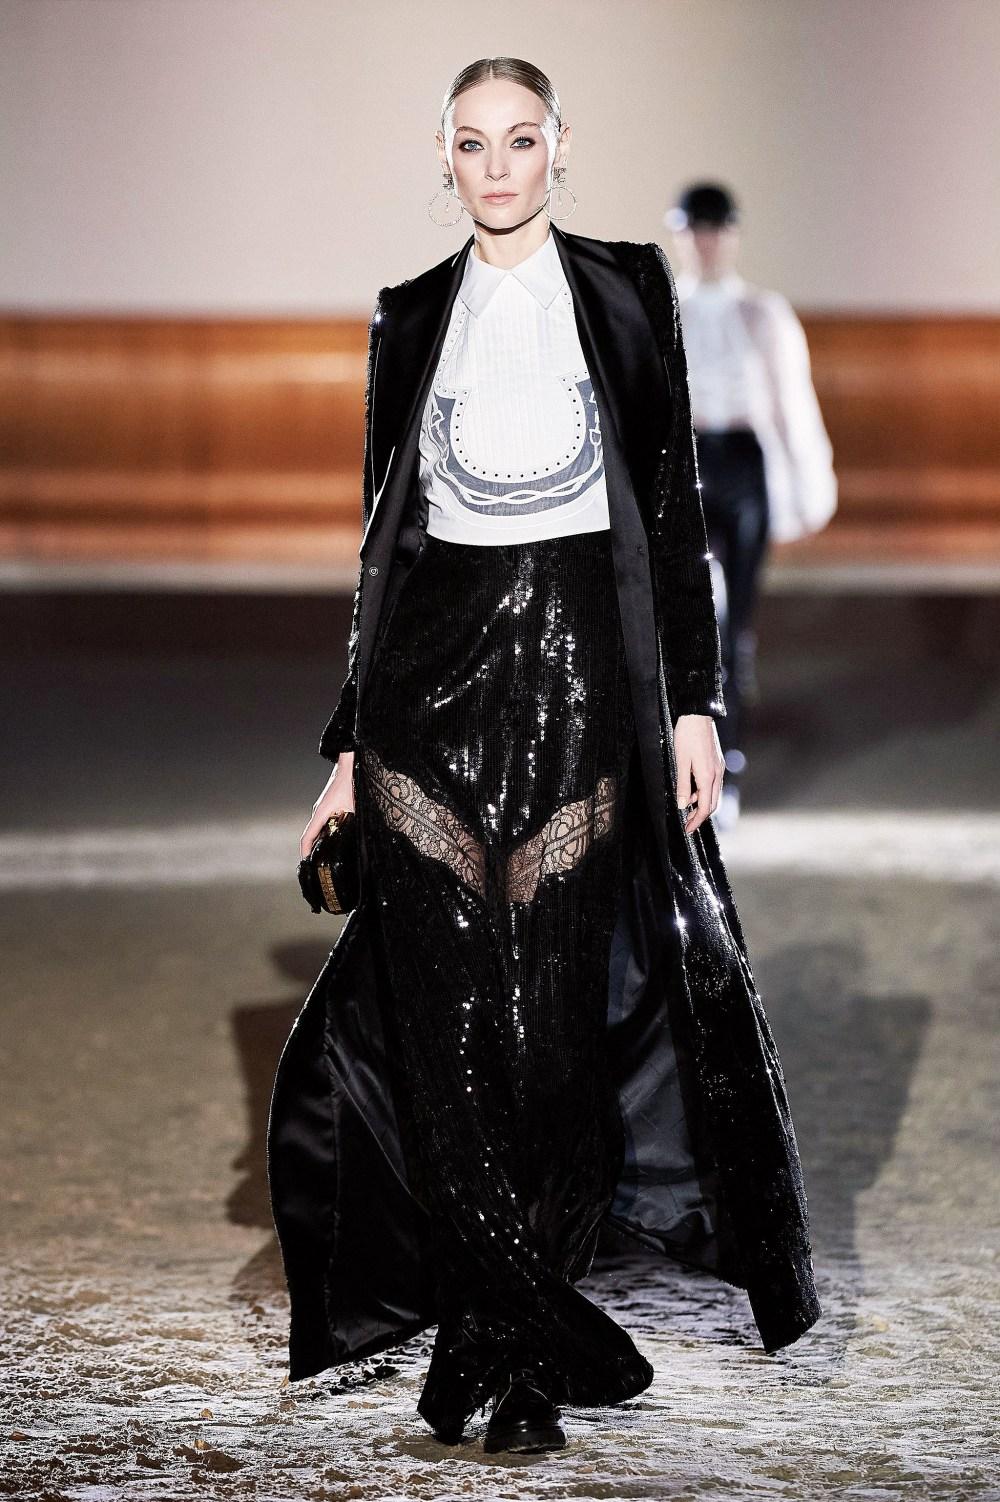 Elisabetta Franchi: Elisabetta Franchi Fall Winter 2021-22 Fashion Show Photo #58